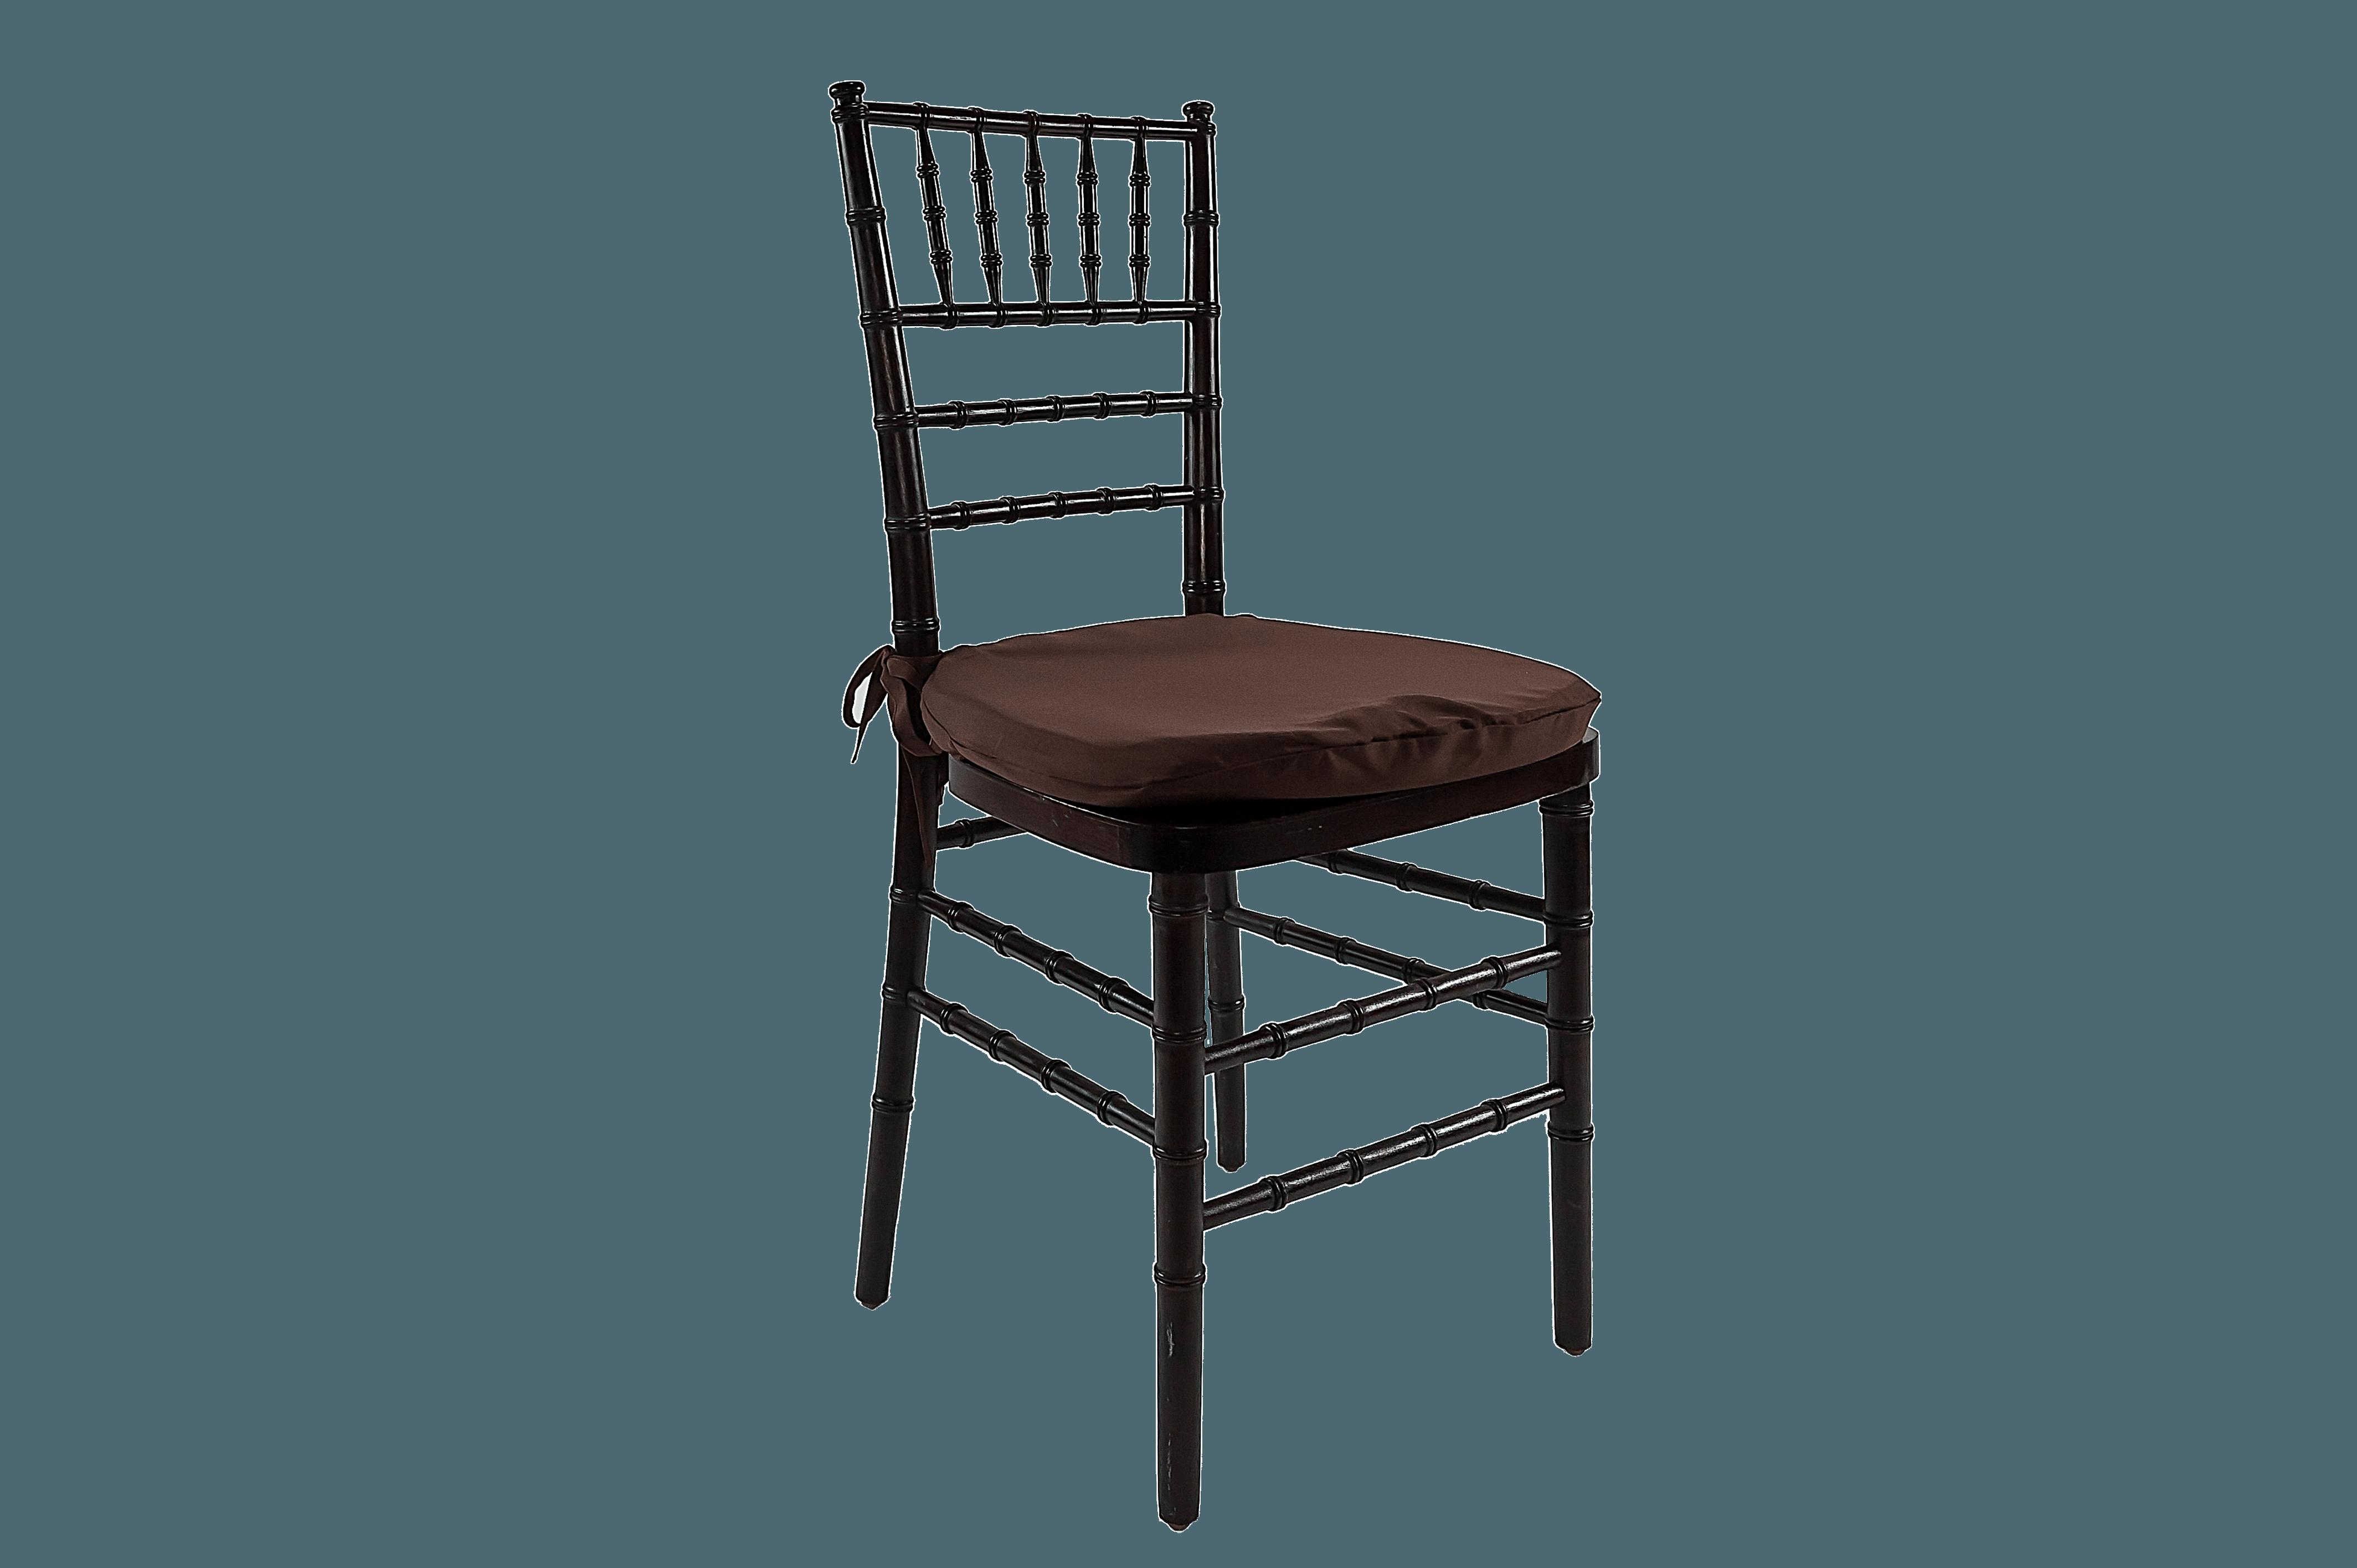 chiavari chairs china swivel chair no wheels mahogany a classic party rental